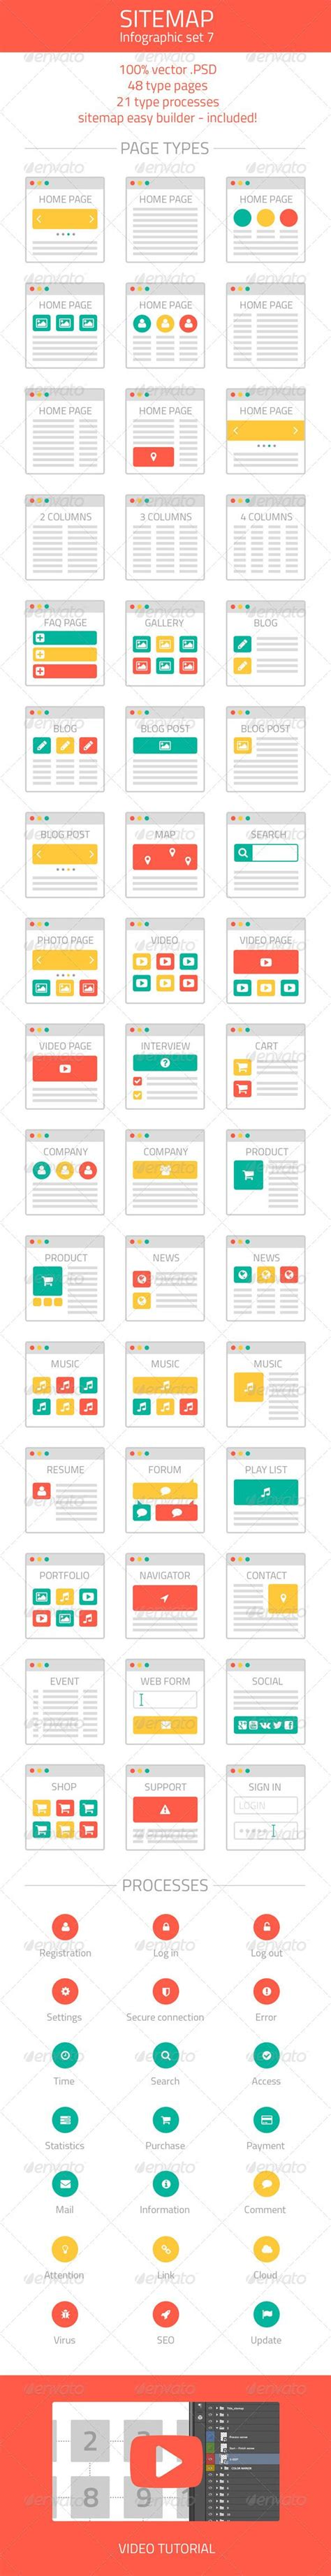 1000+ Images About Flowchart Websites  Sitemaps On